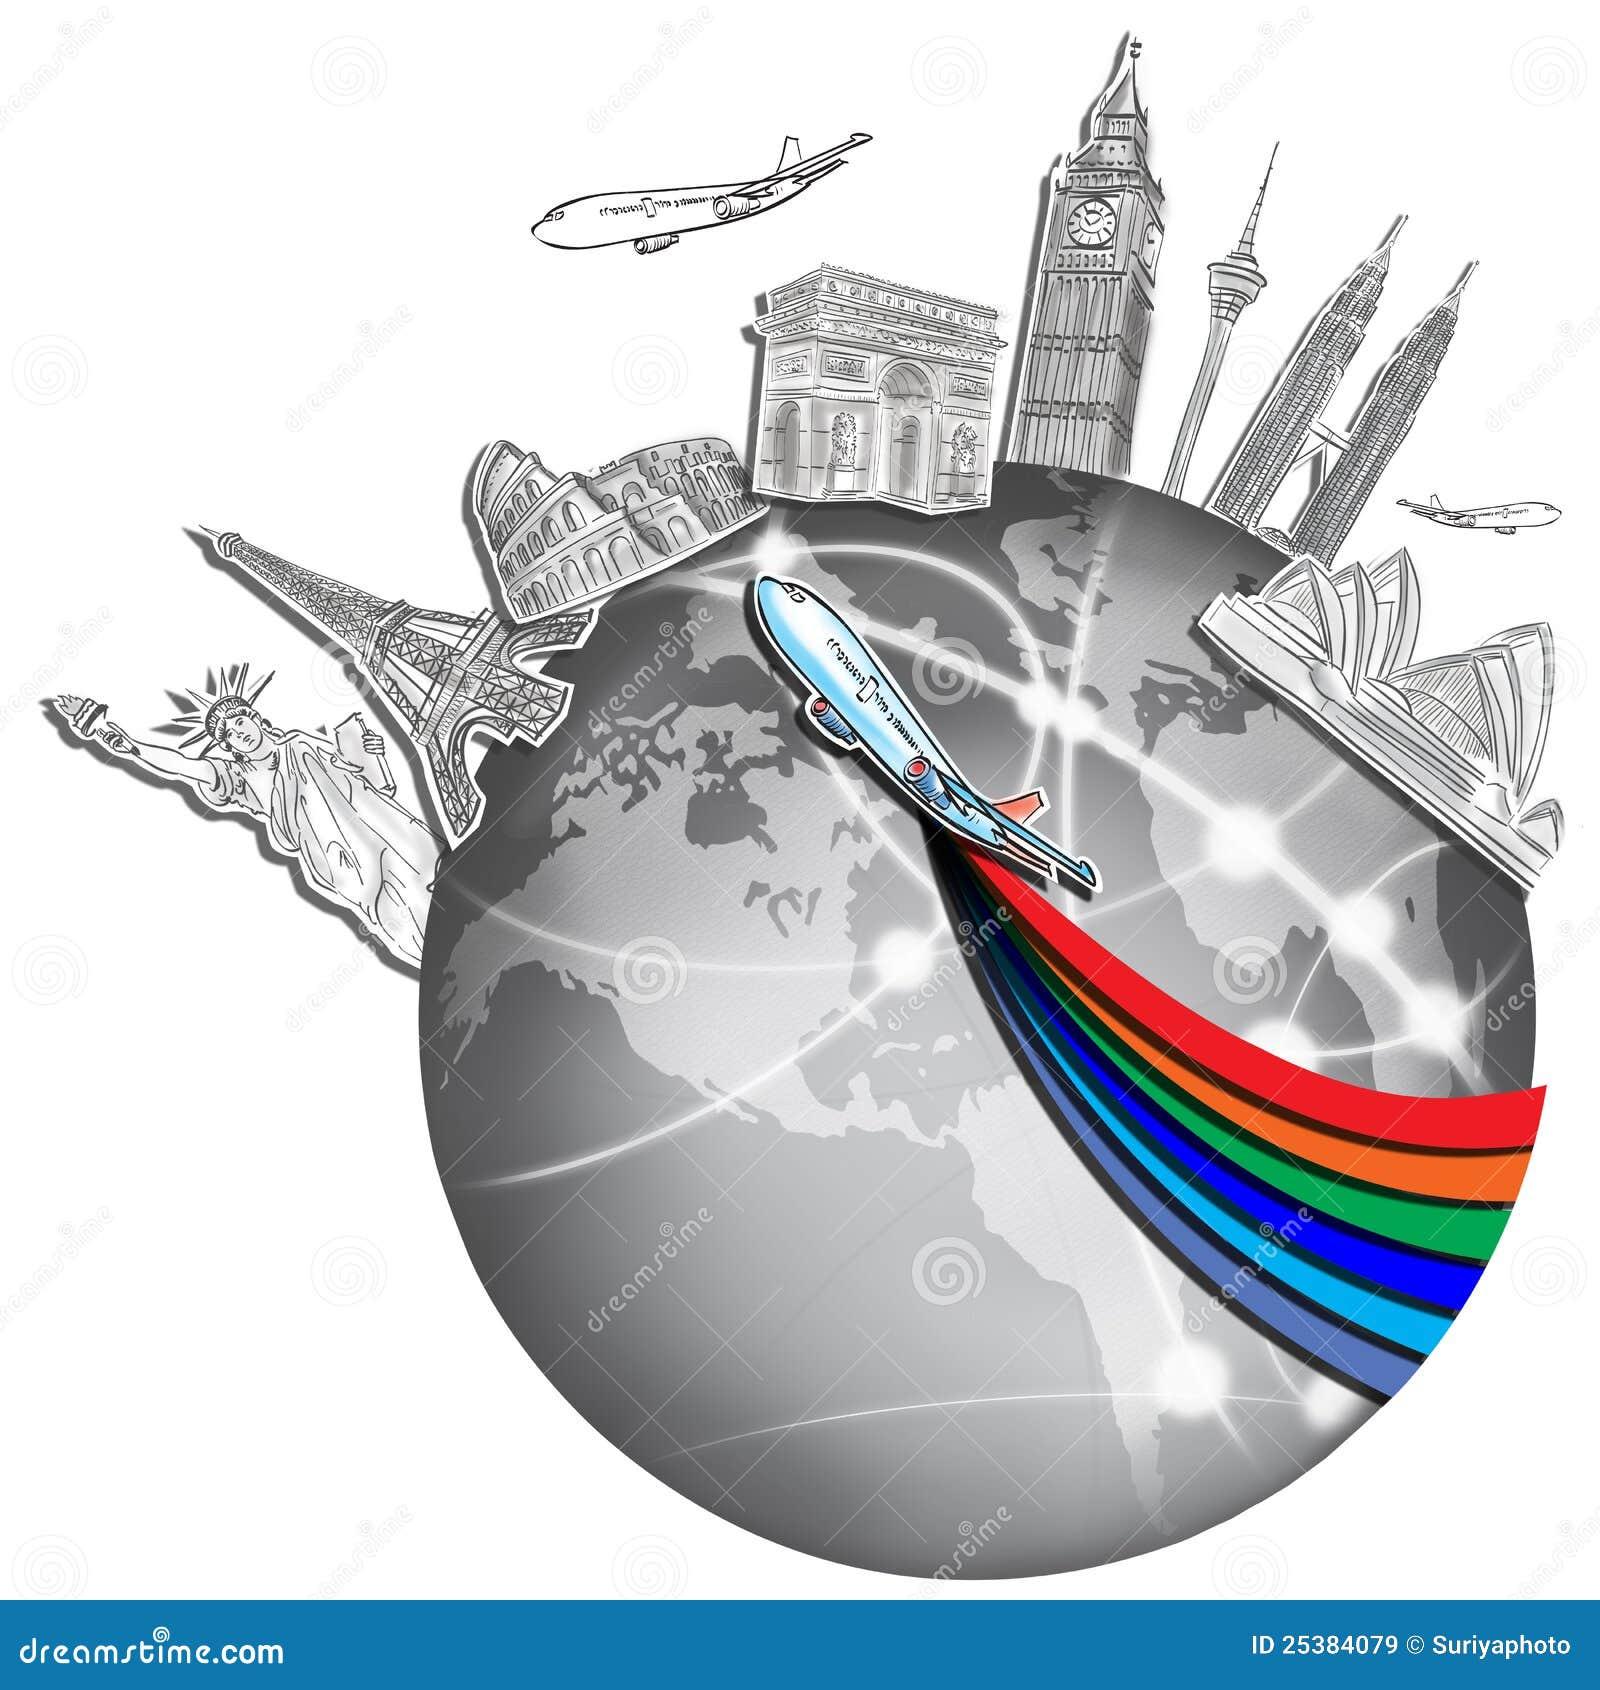 Drawing The Dream Travel Around World Stock Image